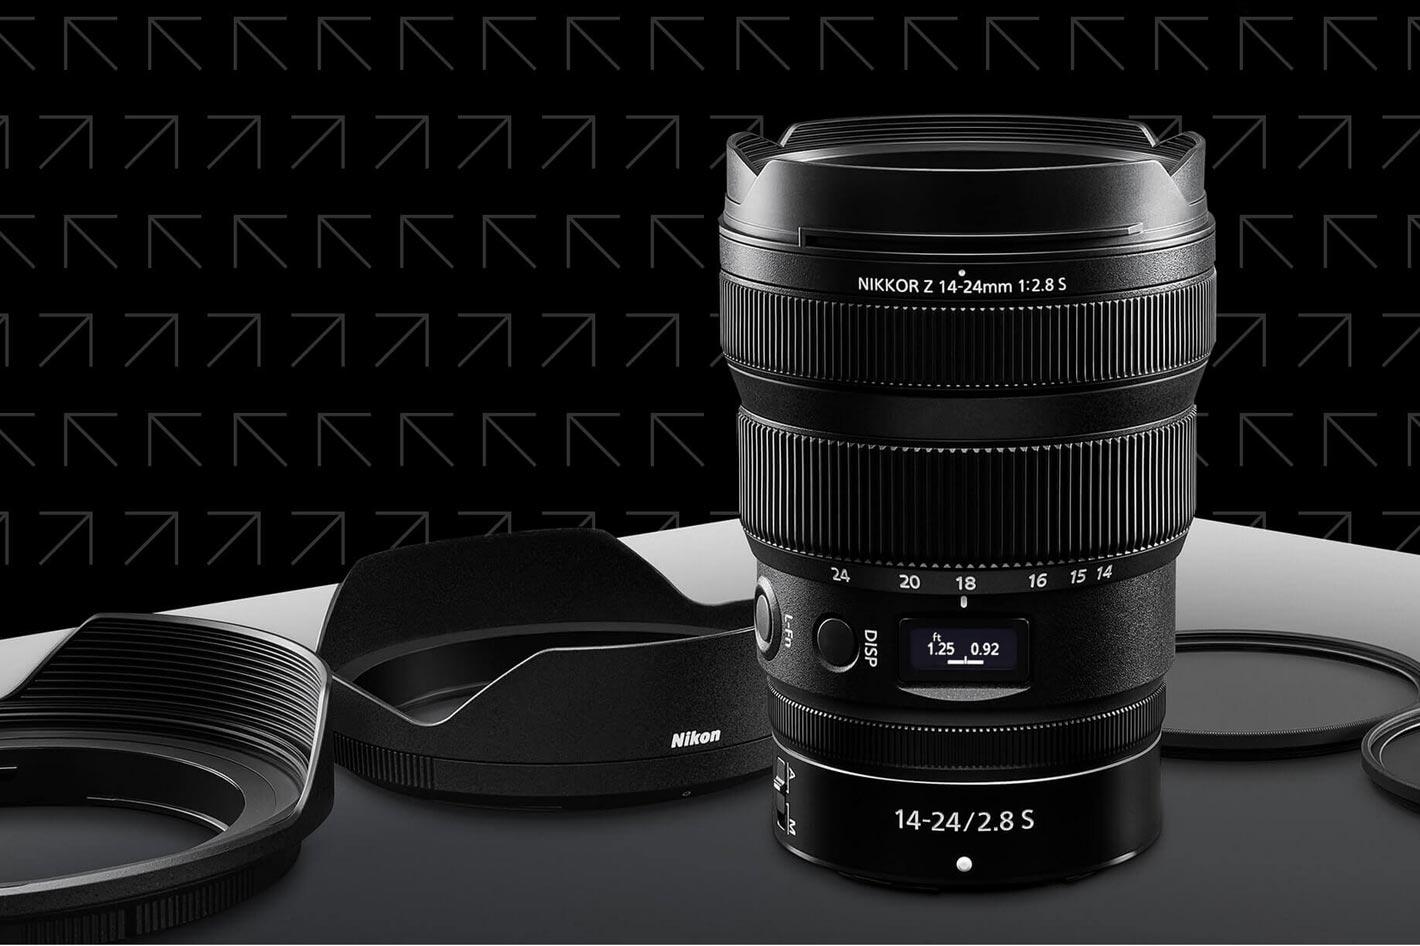 Light Pollution Filter NiSi 112mm Circular Natural Night Filter for Nikon Z 14-24mm f//2.8S